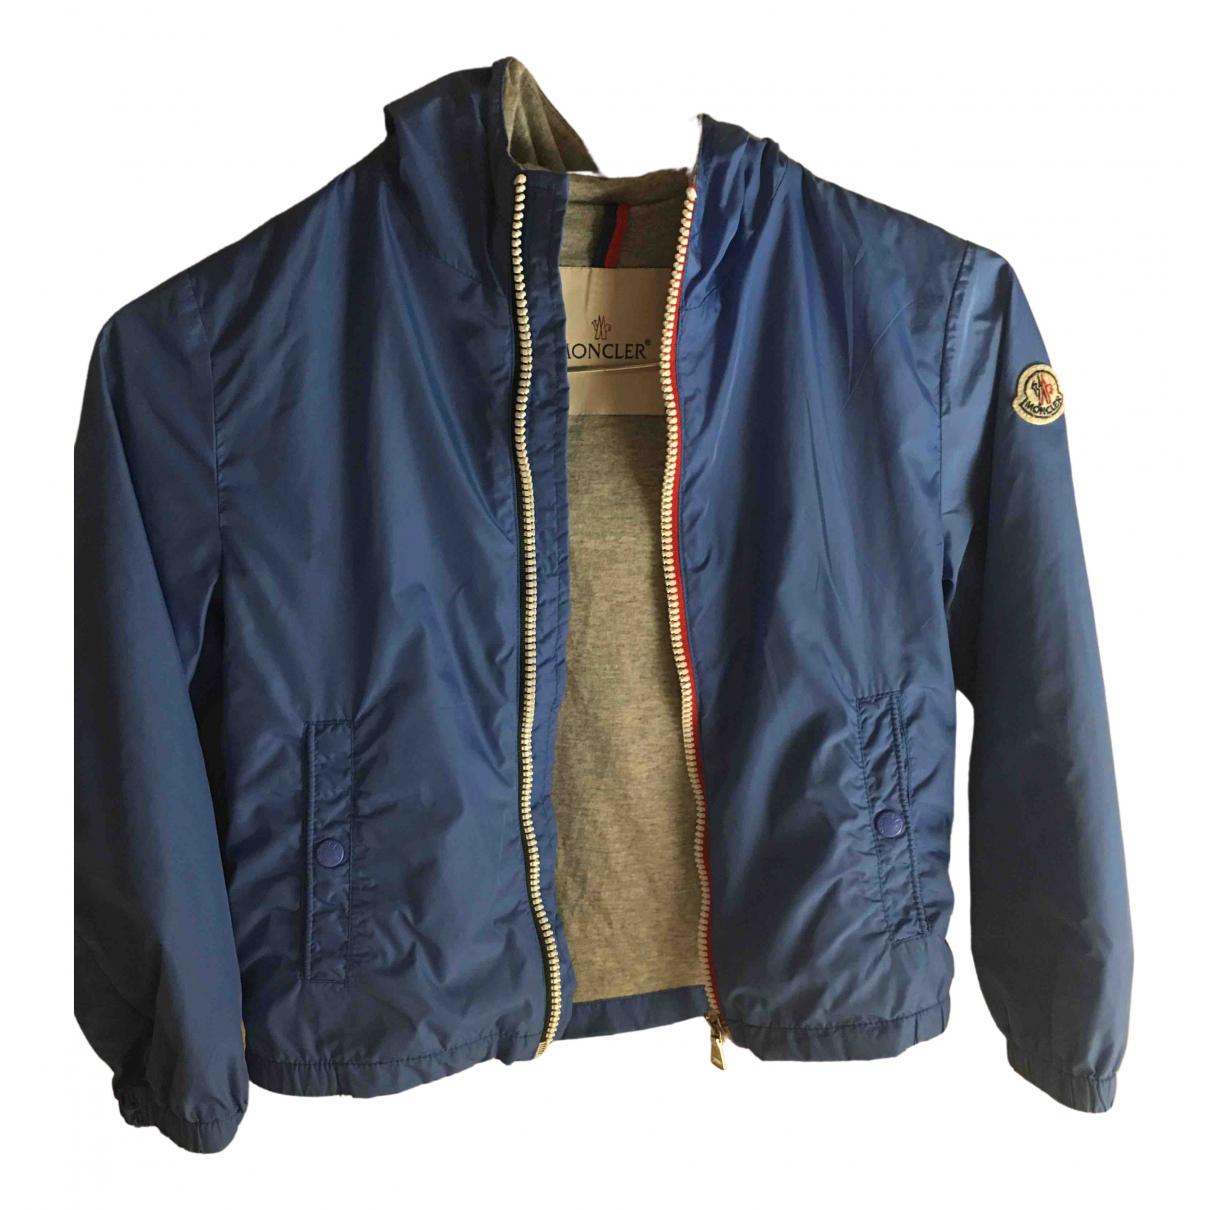 Moncler \N Blue jacket & coat for Kids 6 years - up to 114cm FR